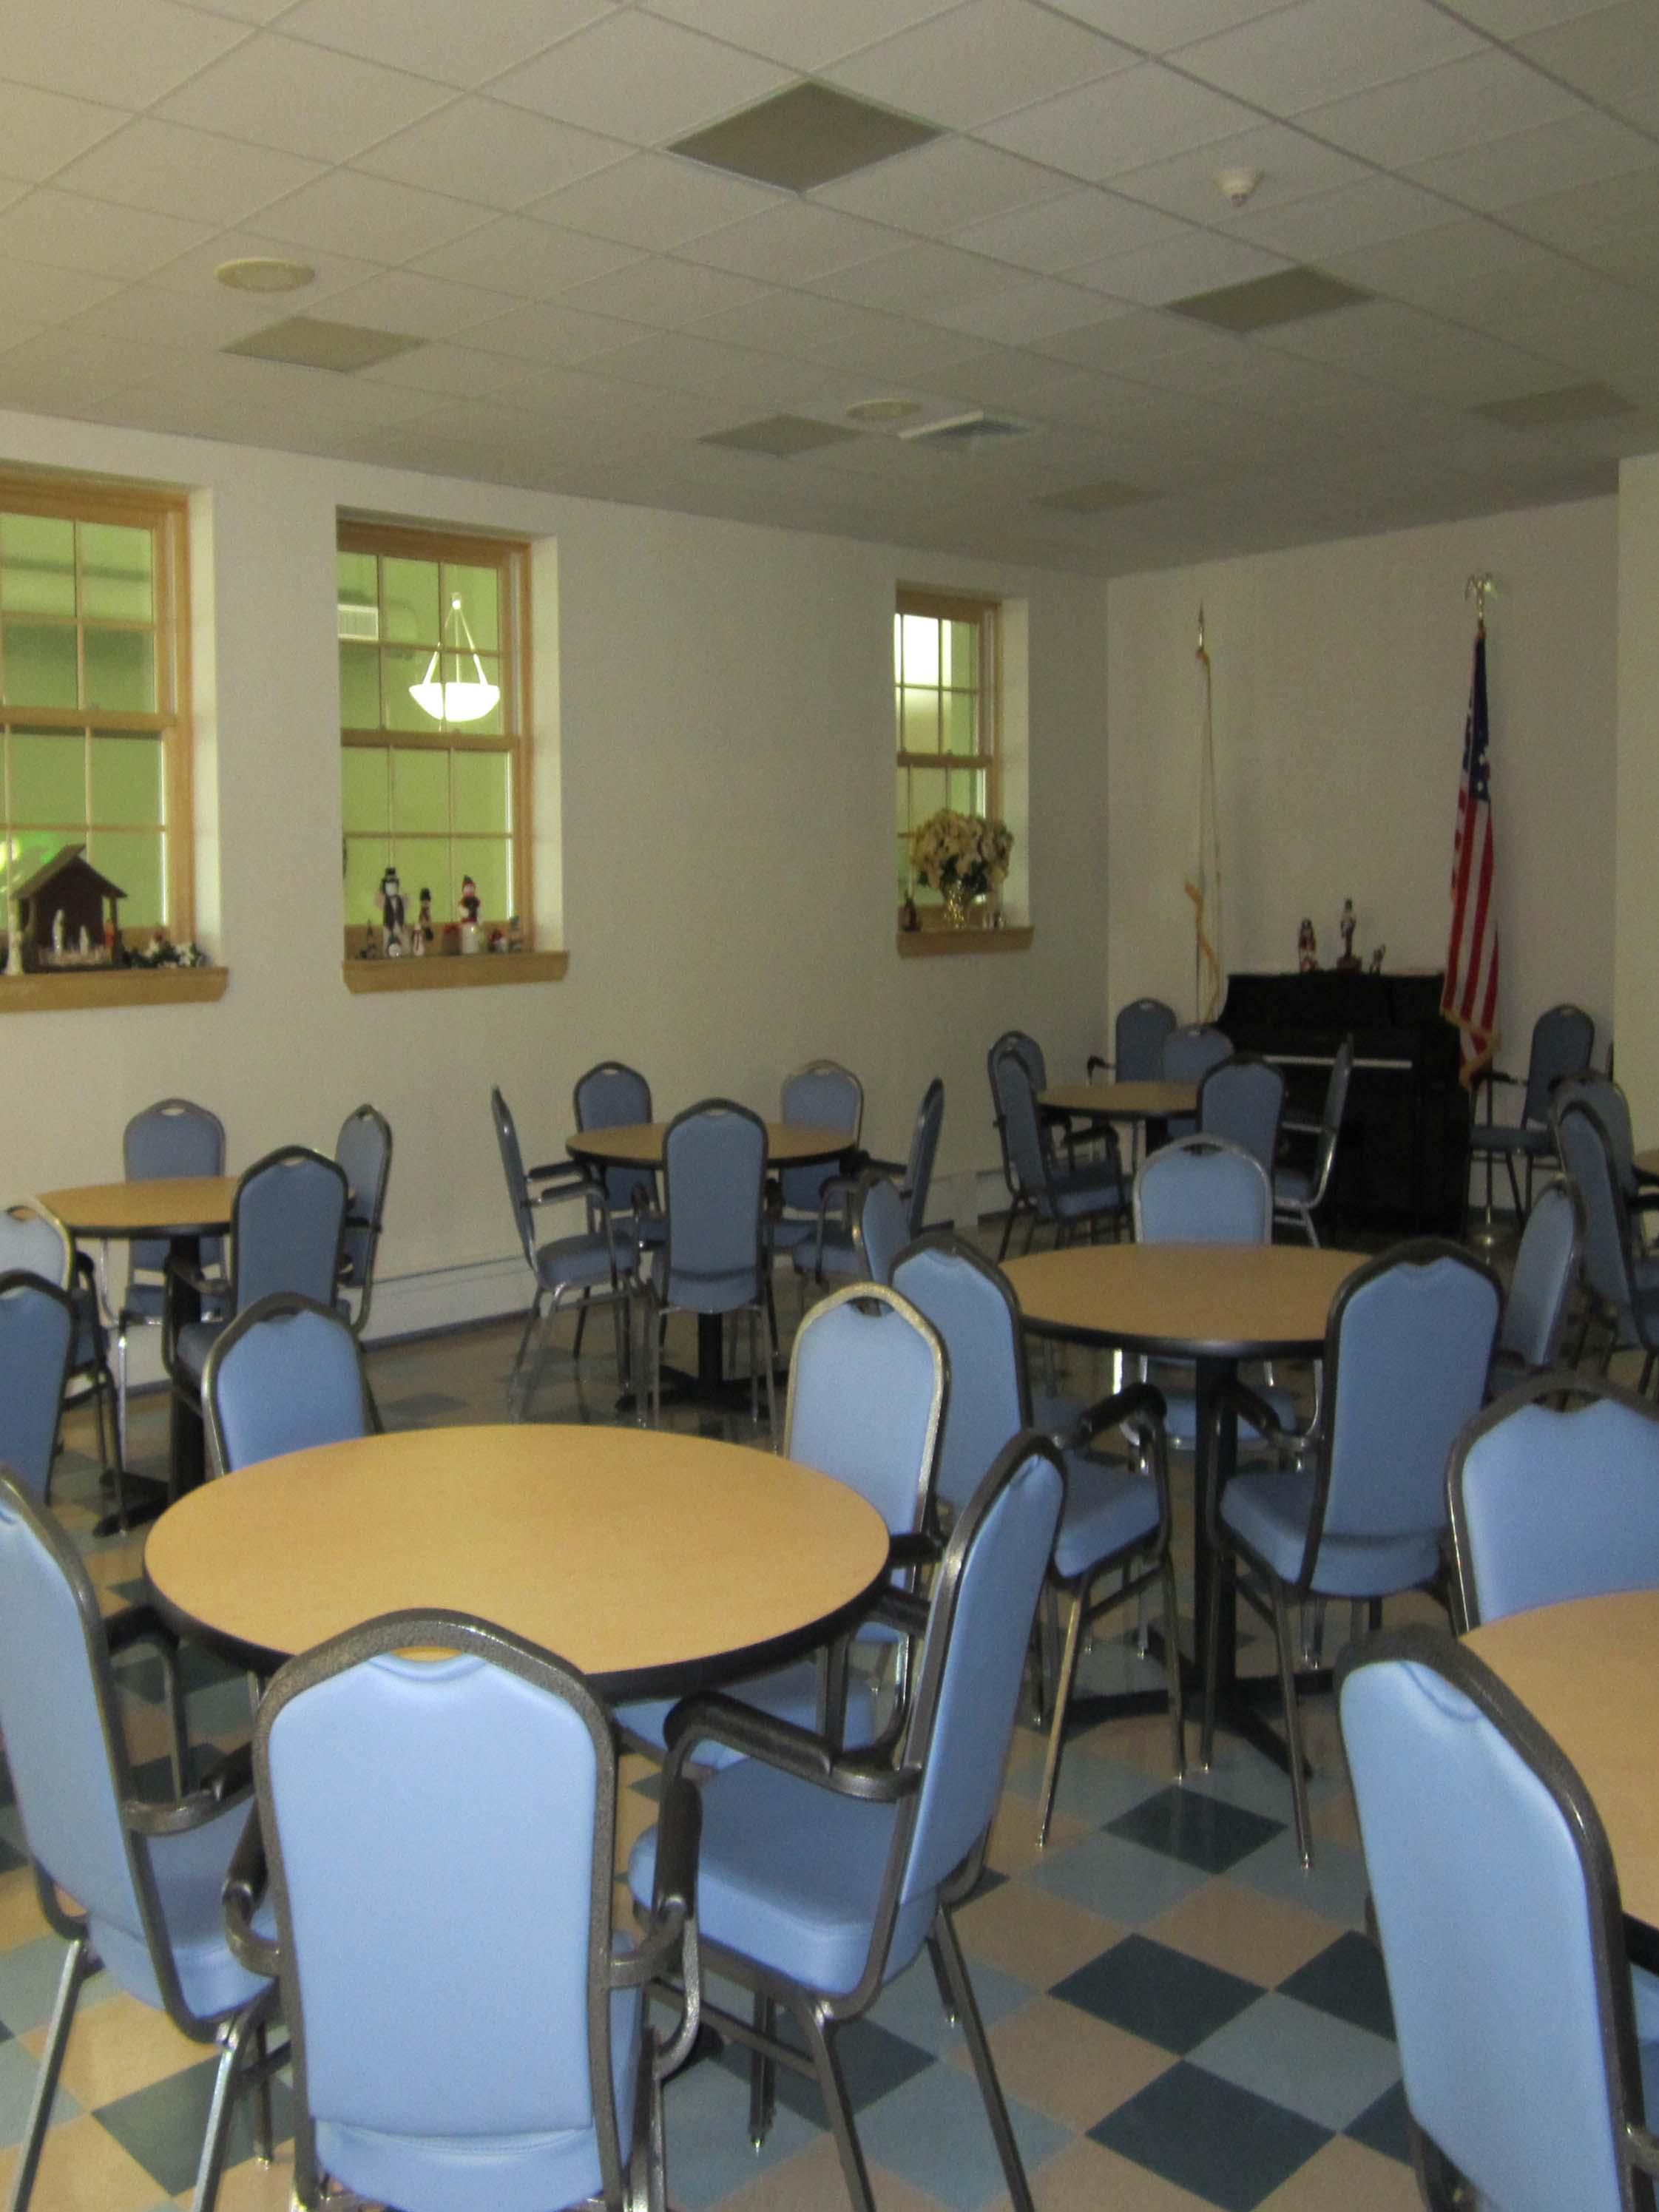 Dining hall pic_edited-1.jpg